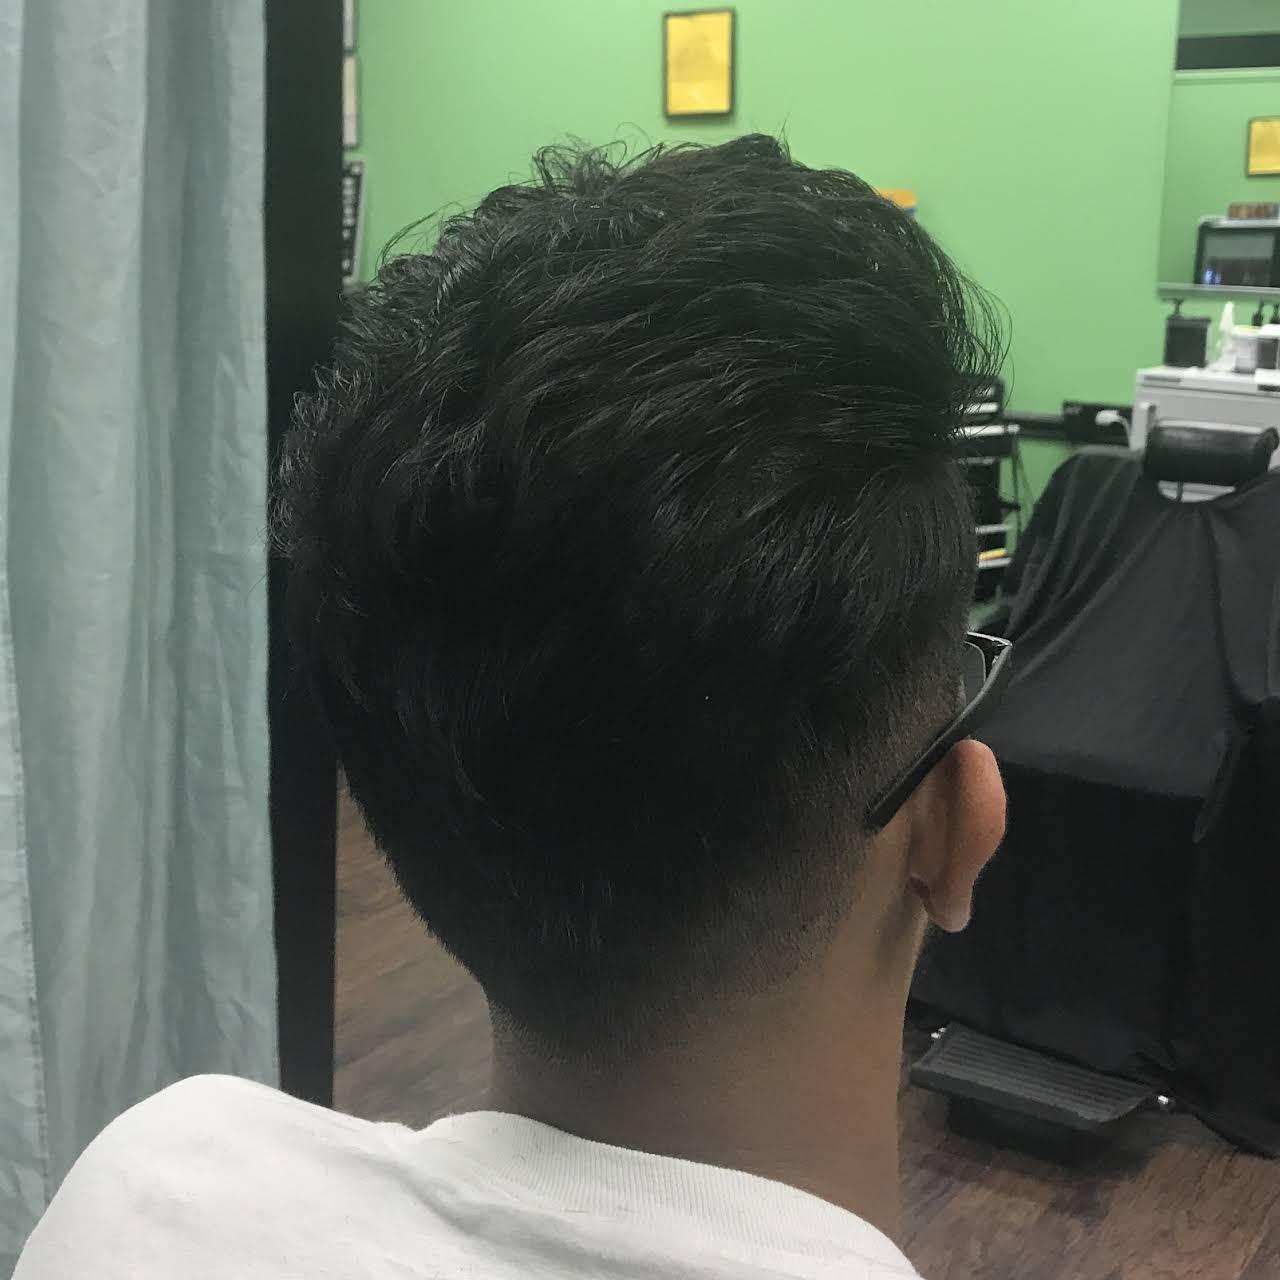 Fade Shop Barbershop Barber Shop In Phenix City